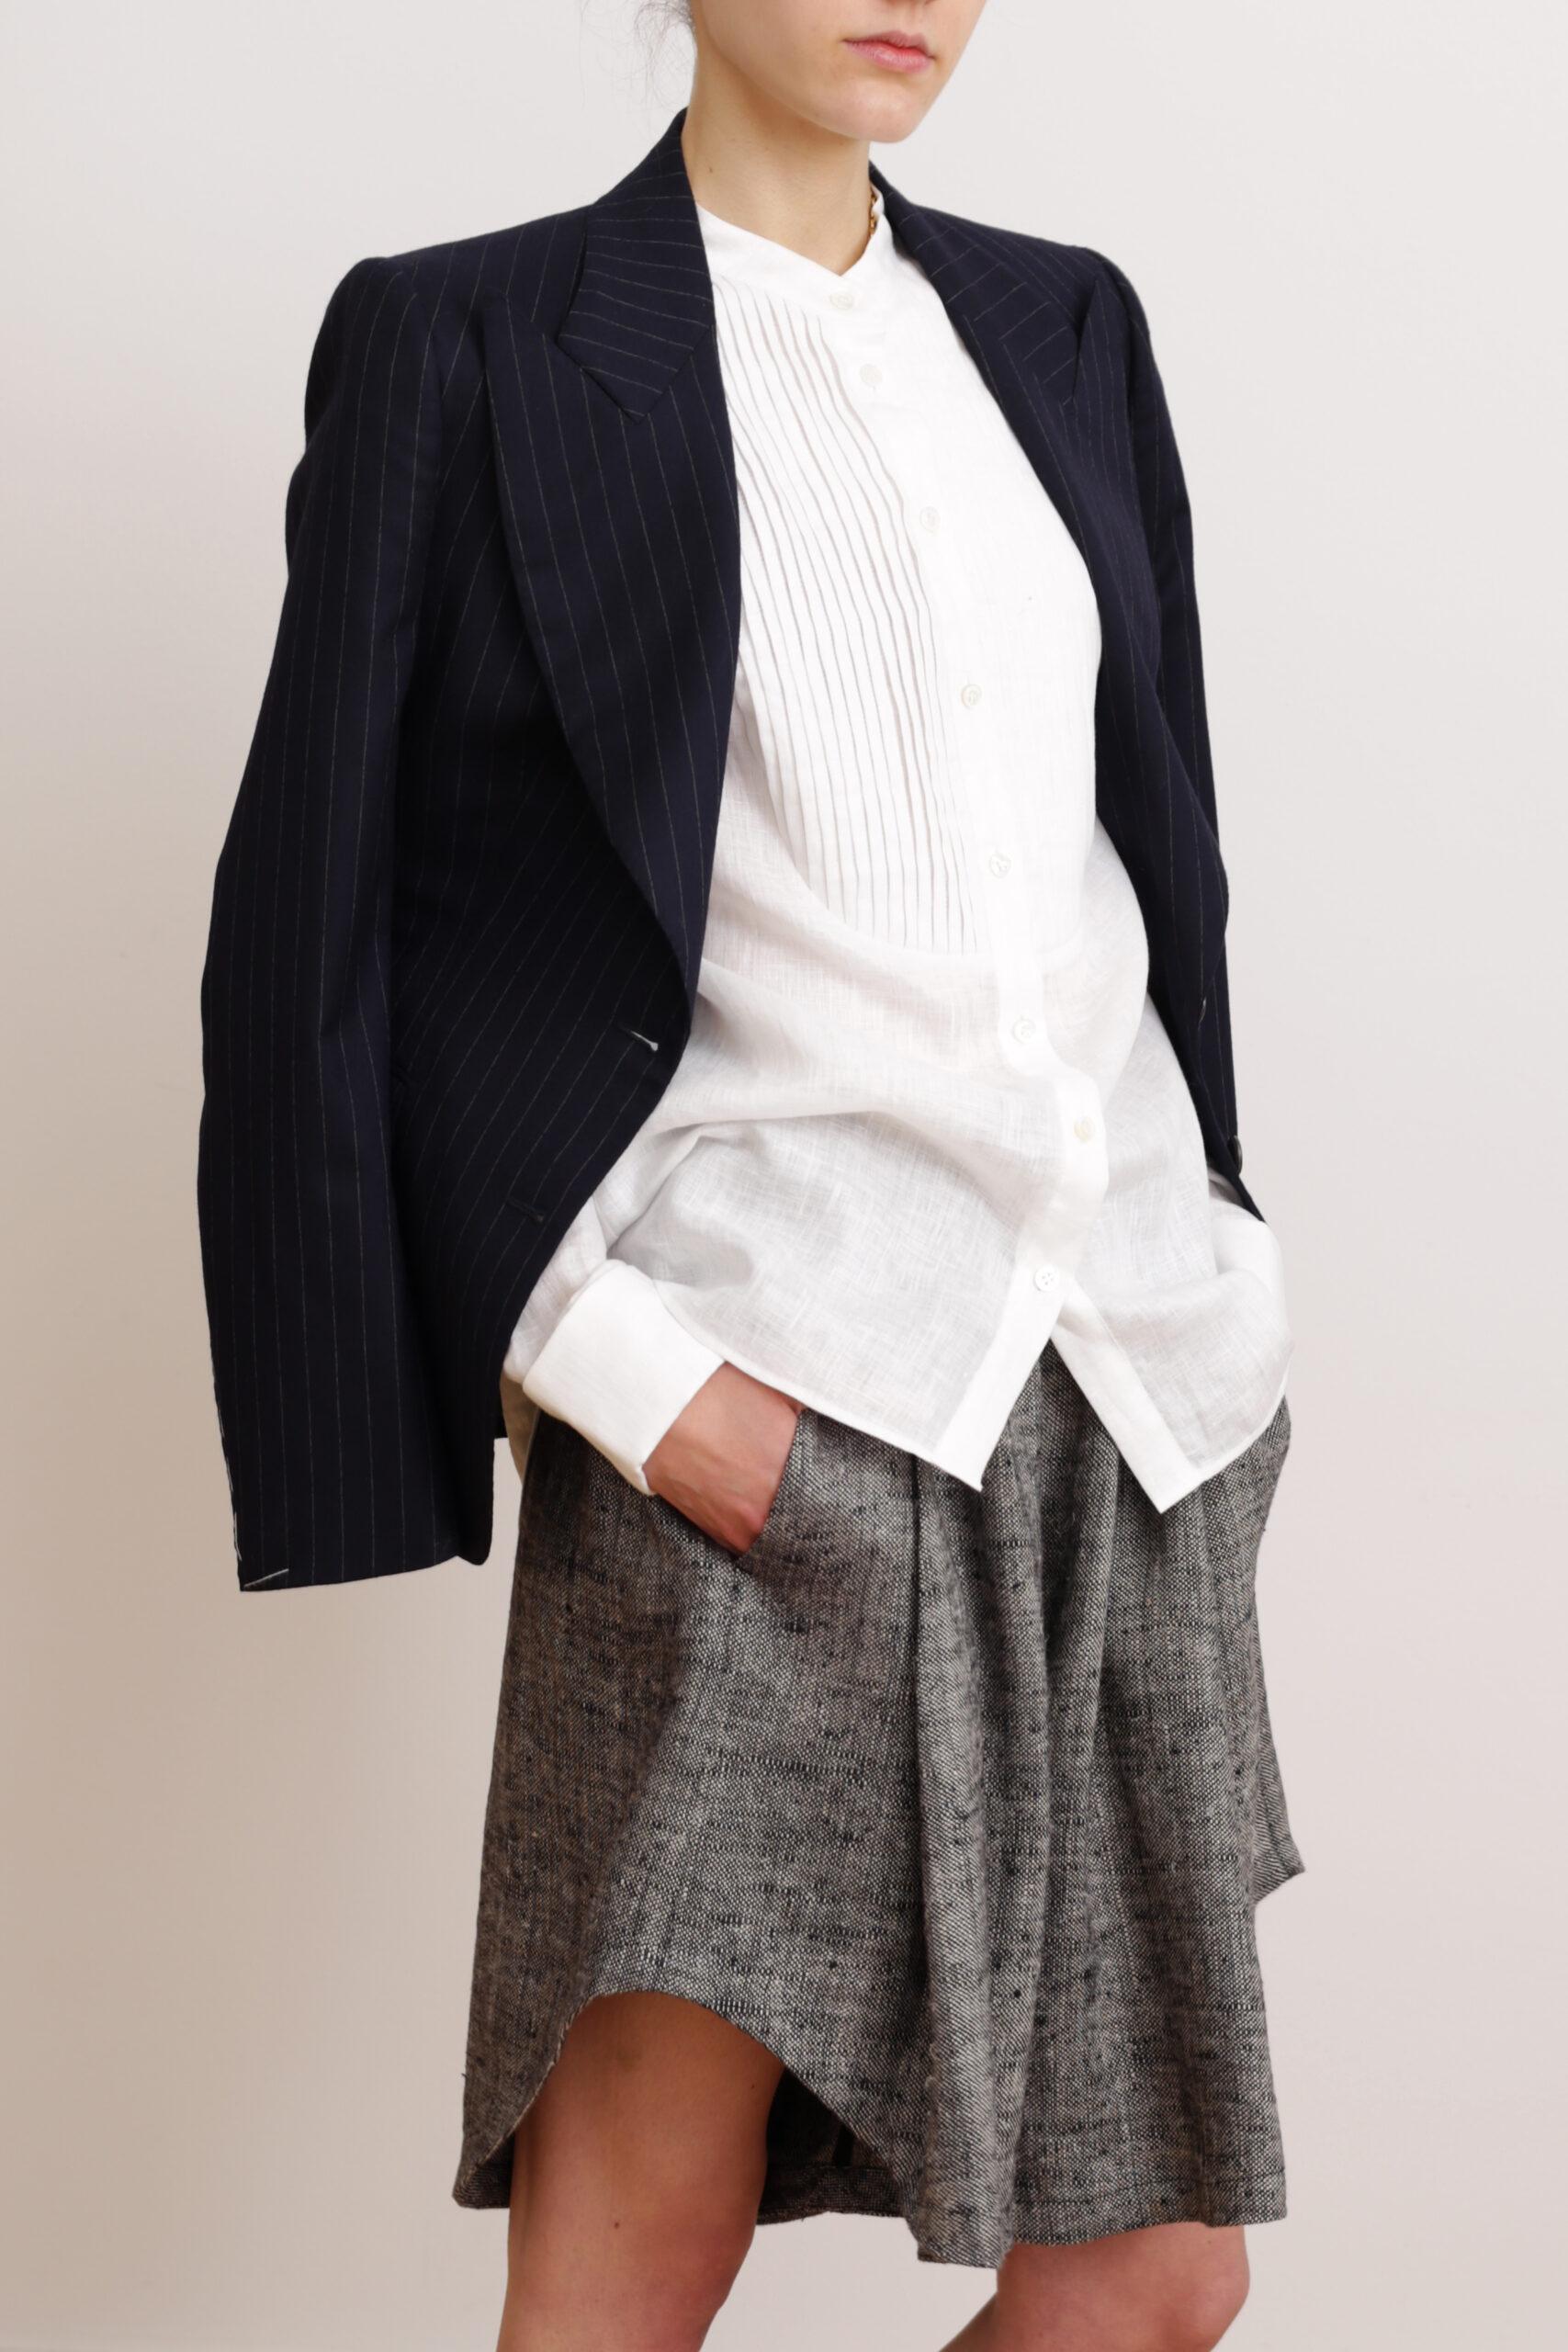 A perfect wardrobe: Sustainable luxury fashion.